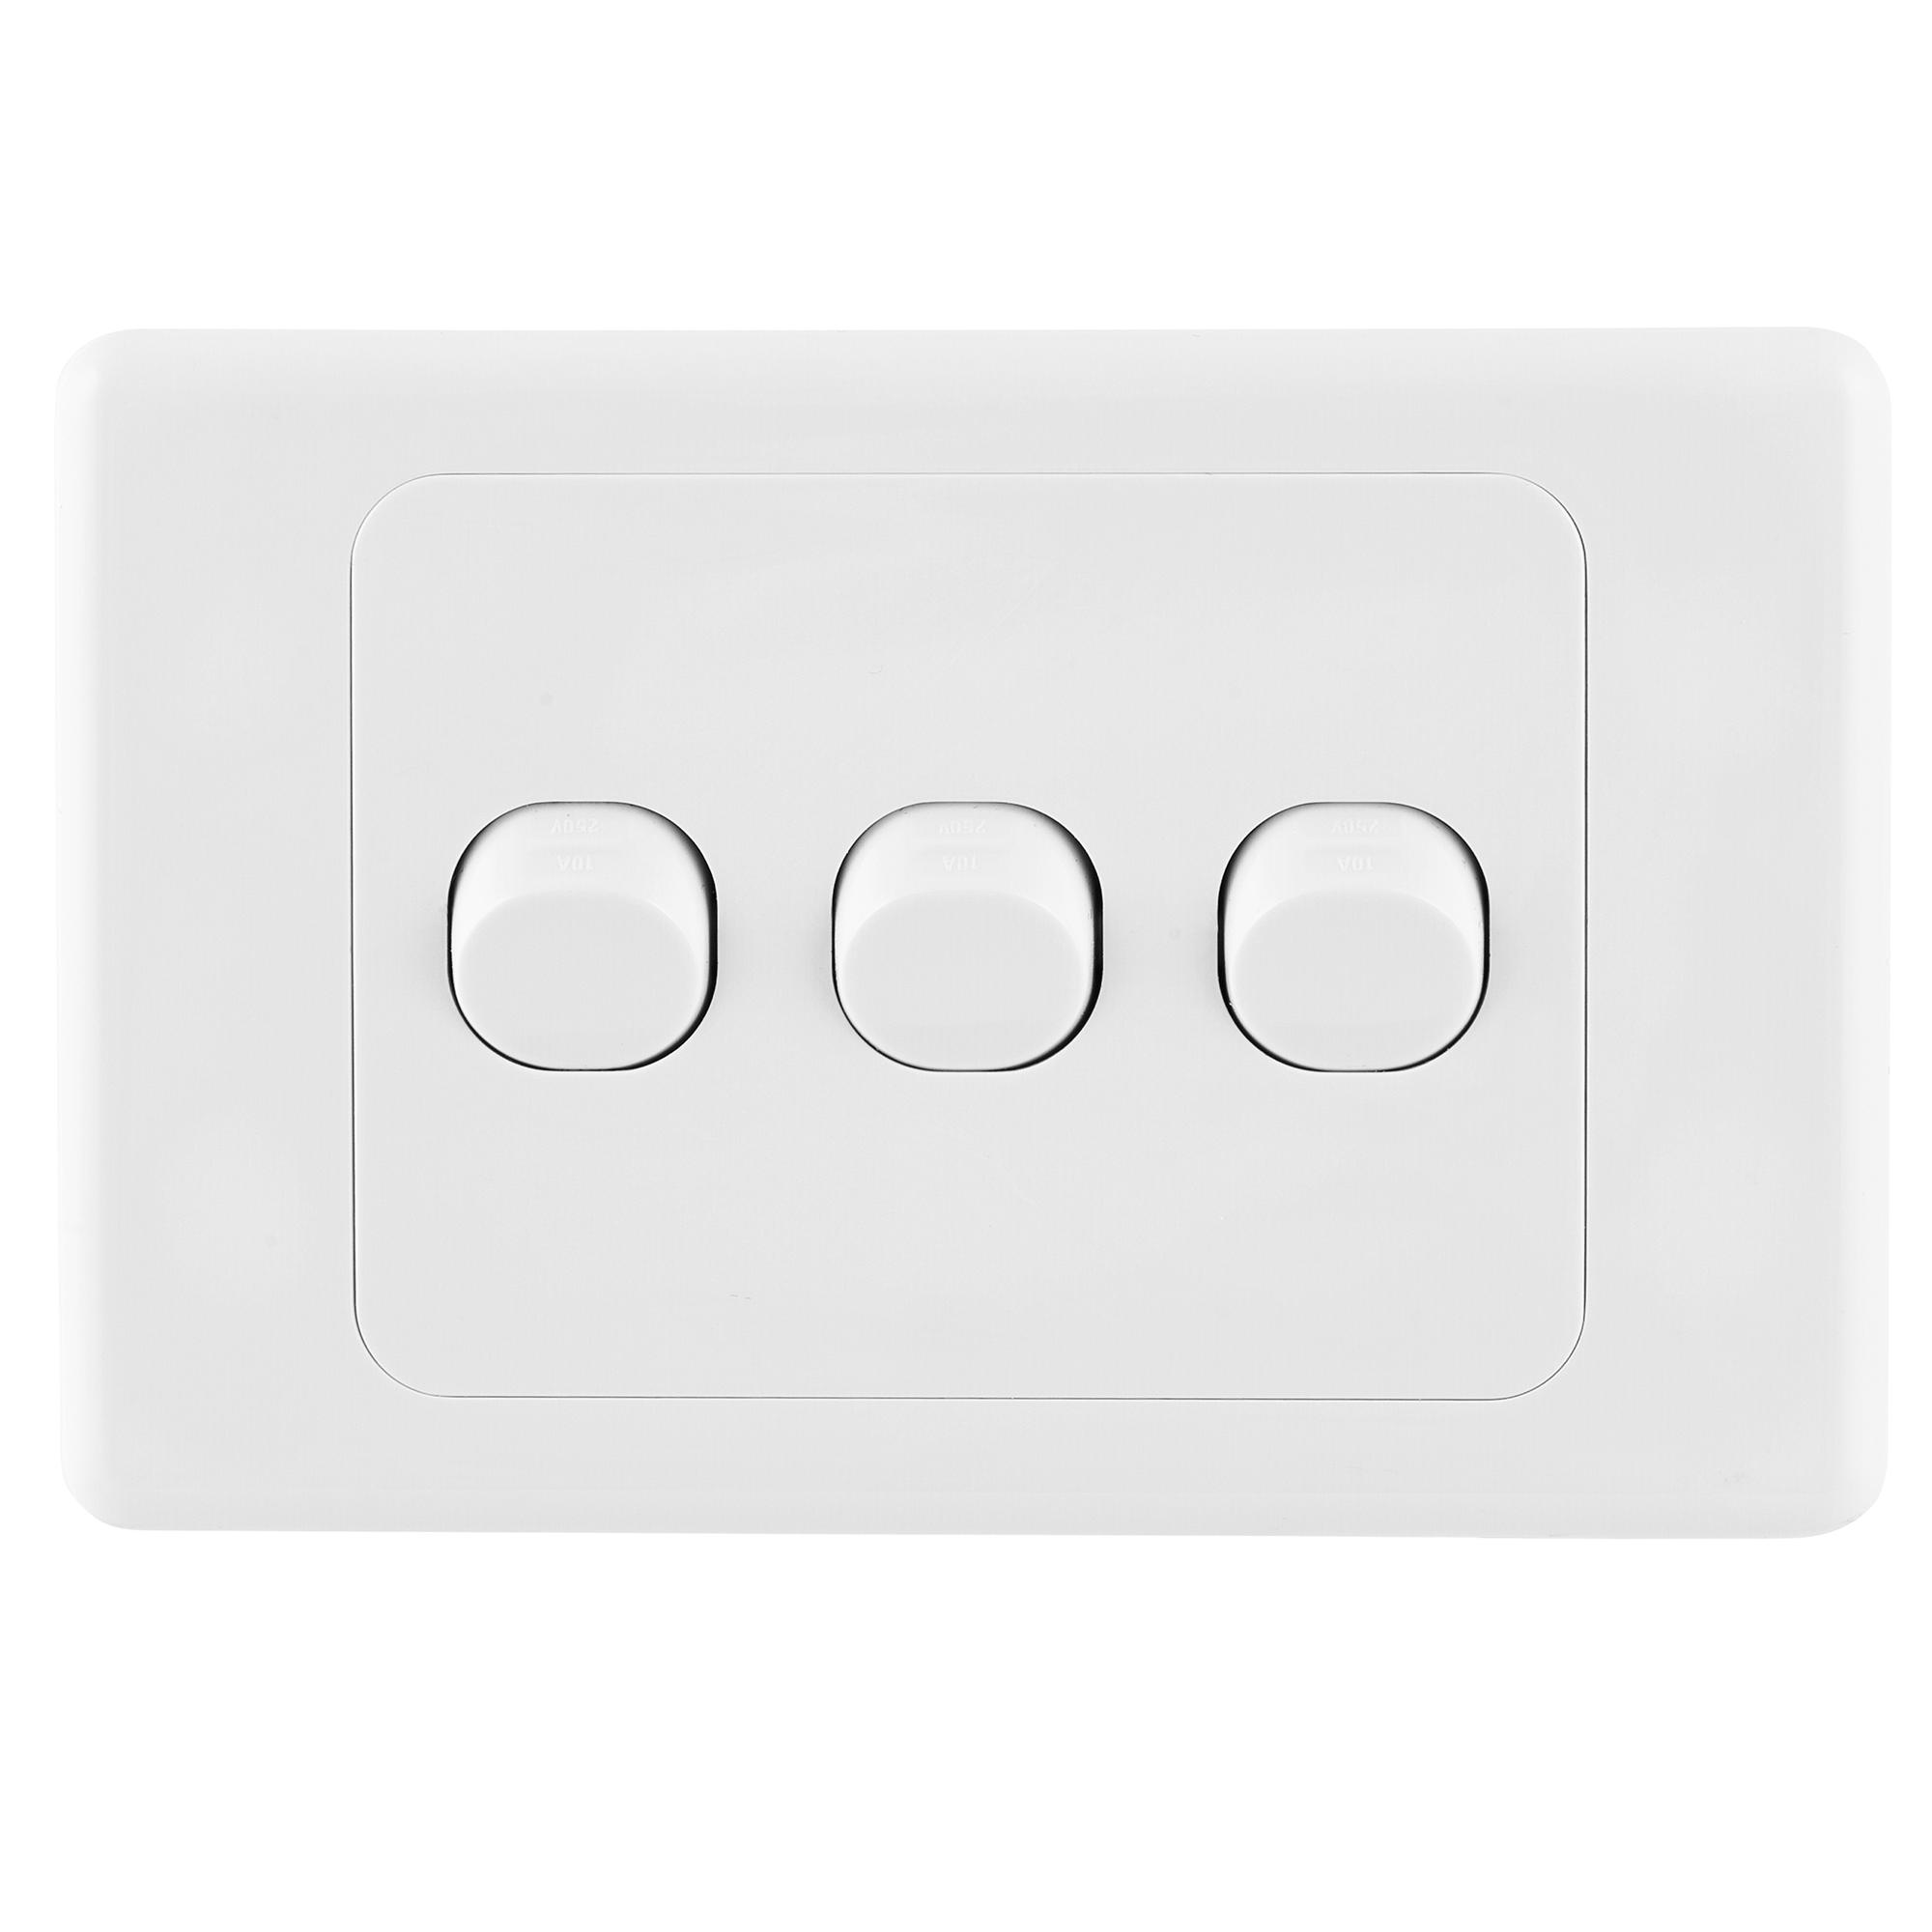 Deta s-line triple switch